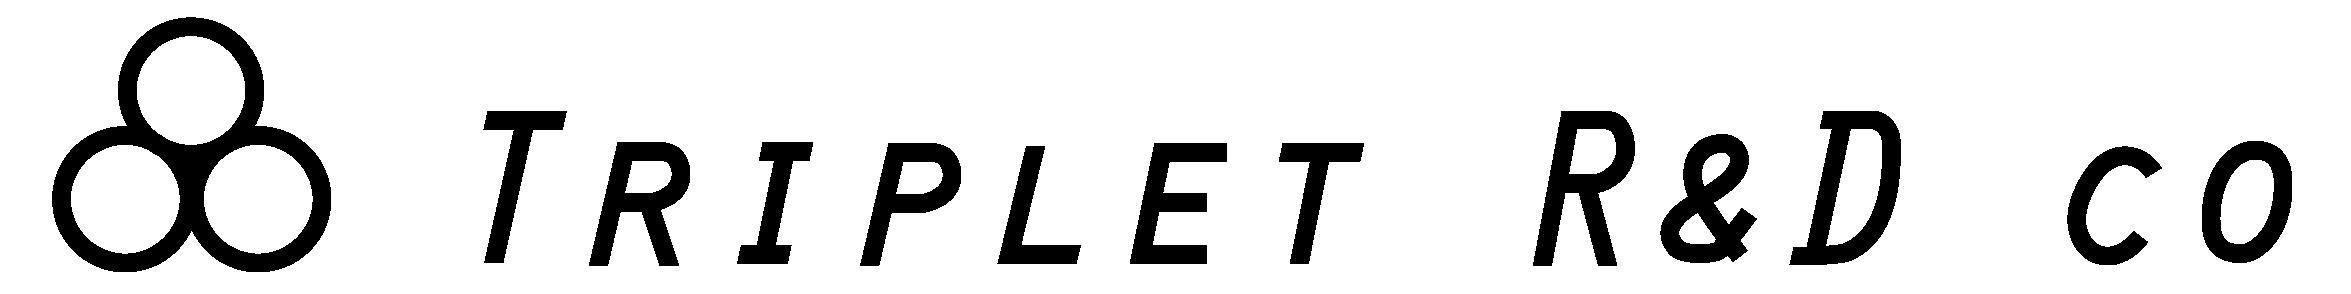 Triplet R&D株式会社